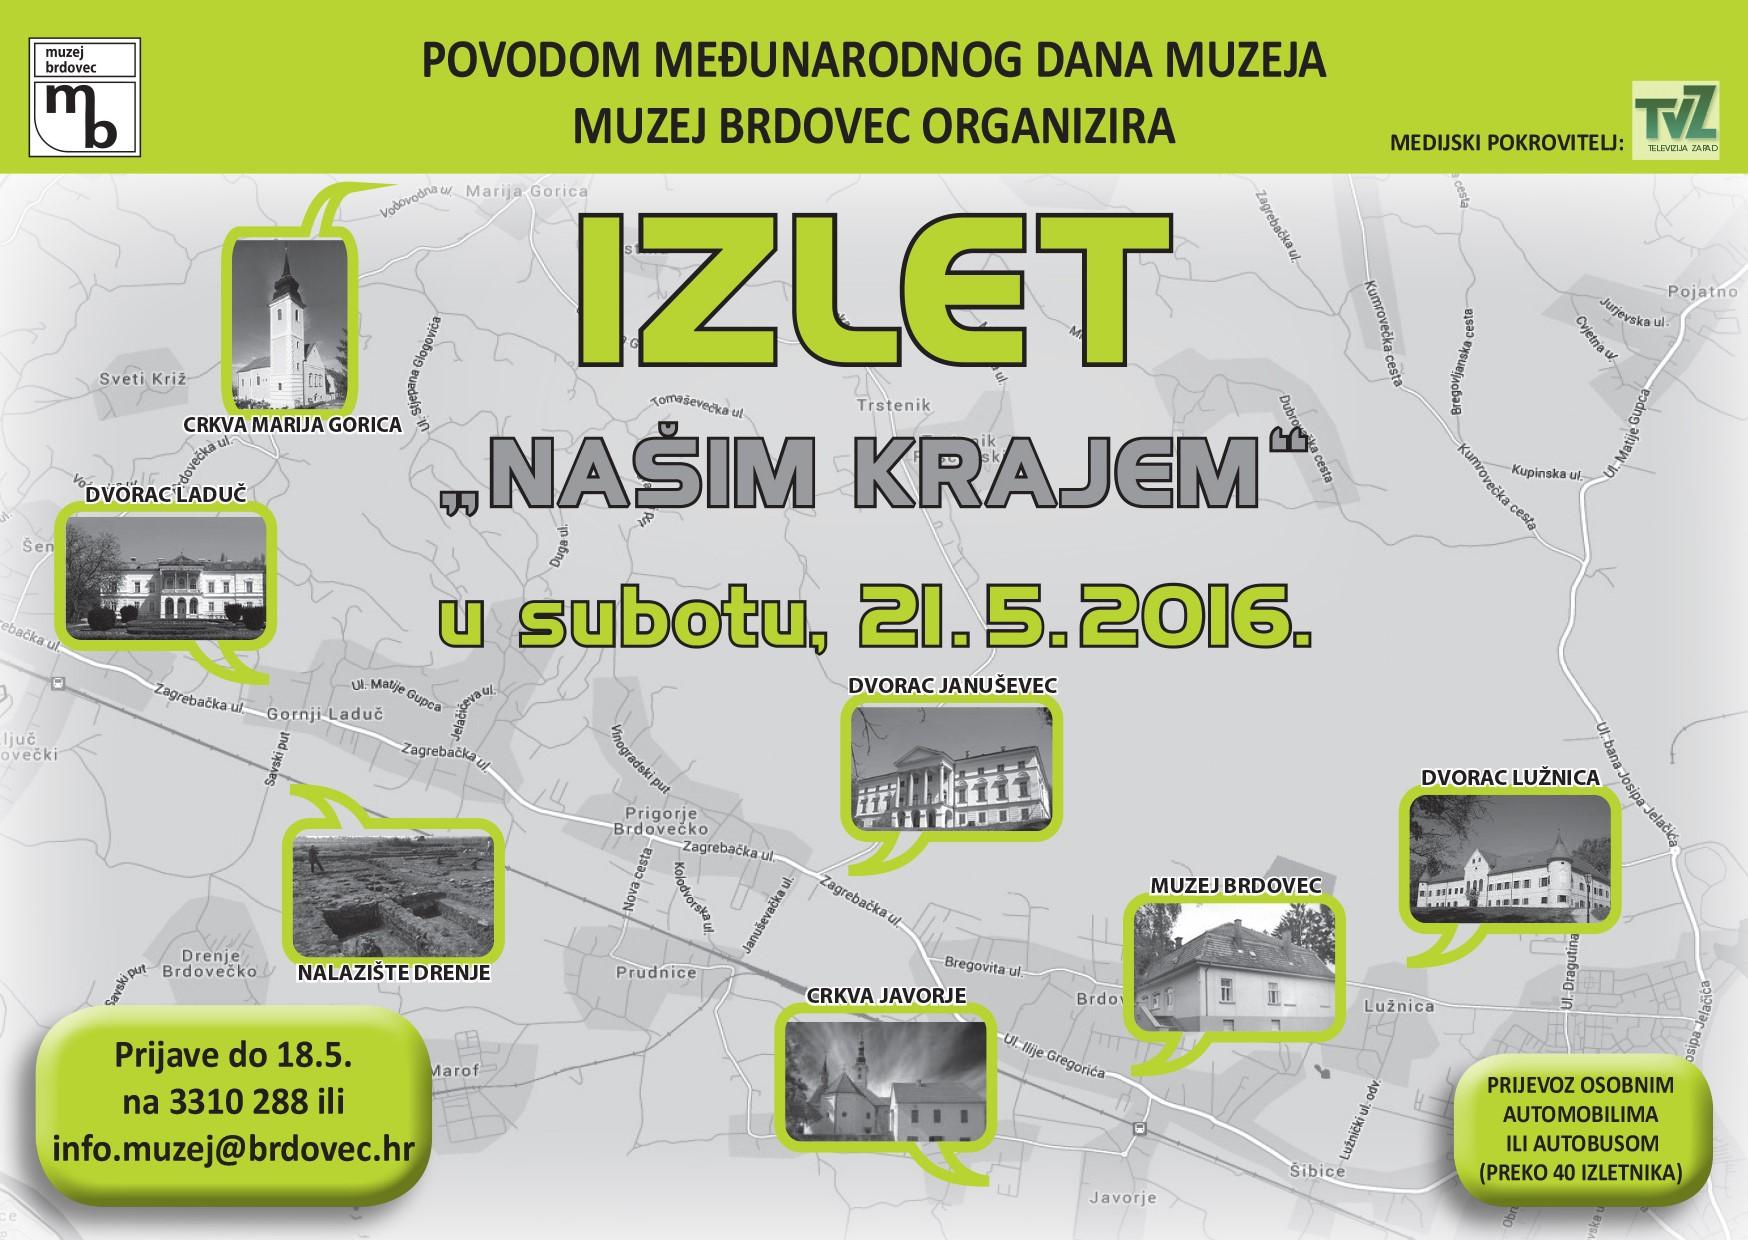 Poziv na izlet za Dan muzeja u zaprešićki kraj